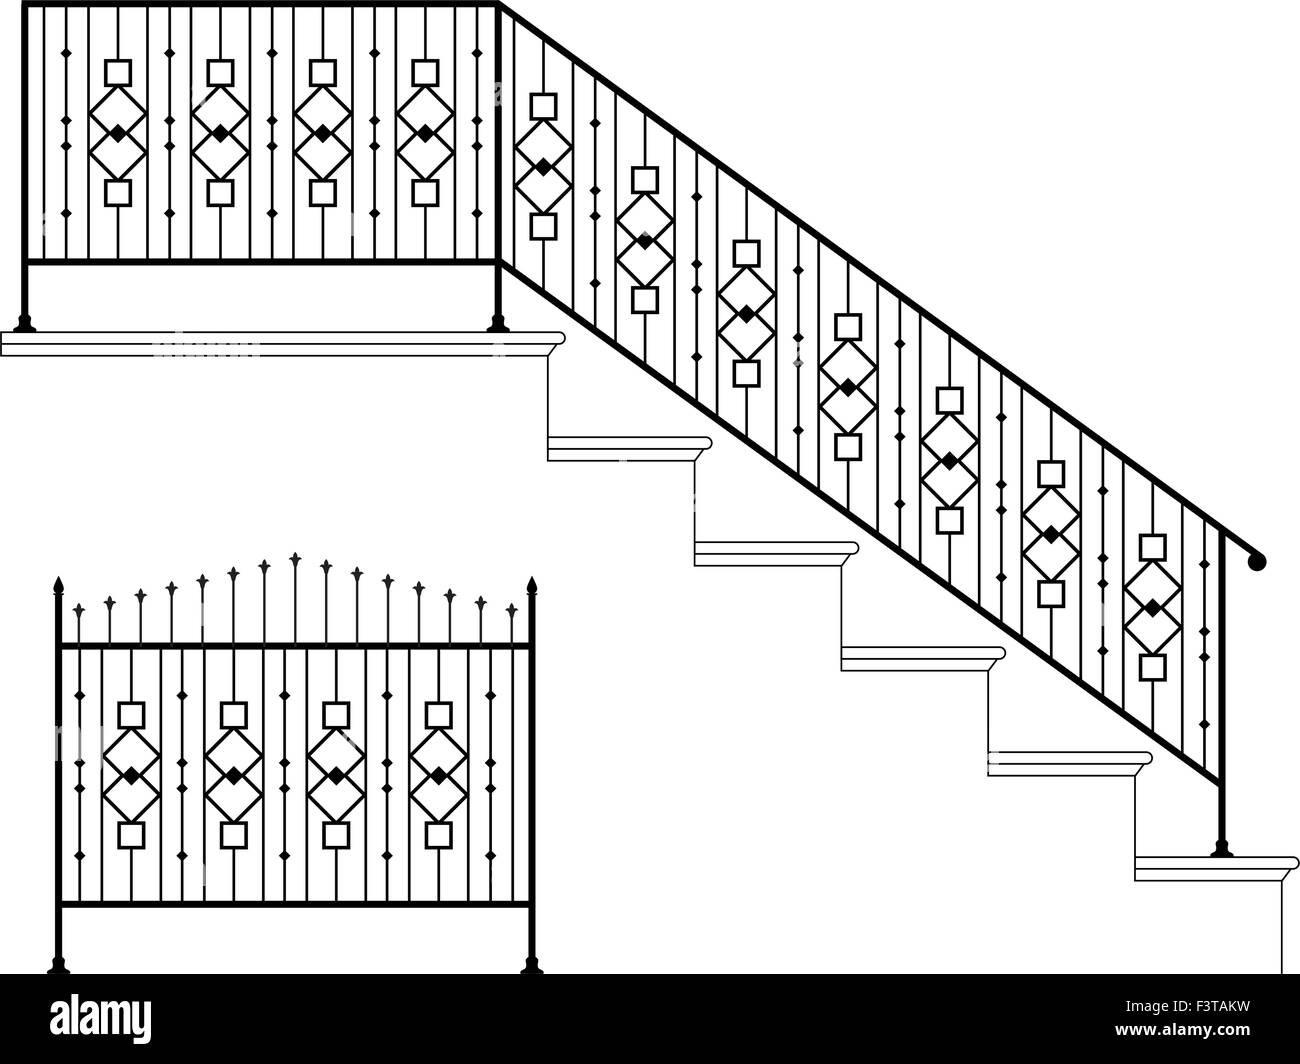 Wrought Iron Stair Railing Design Vector Art Stock Vector Image   Wrought Iron Handrail Designs   Staircase   Iron Pipe   Cast Iron Railing   Garden   Geometric Railing